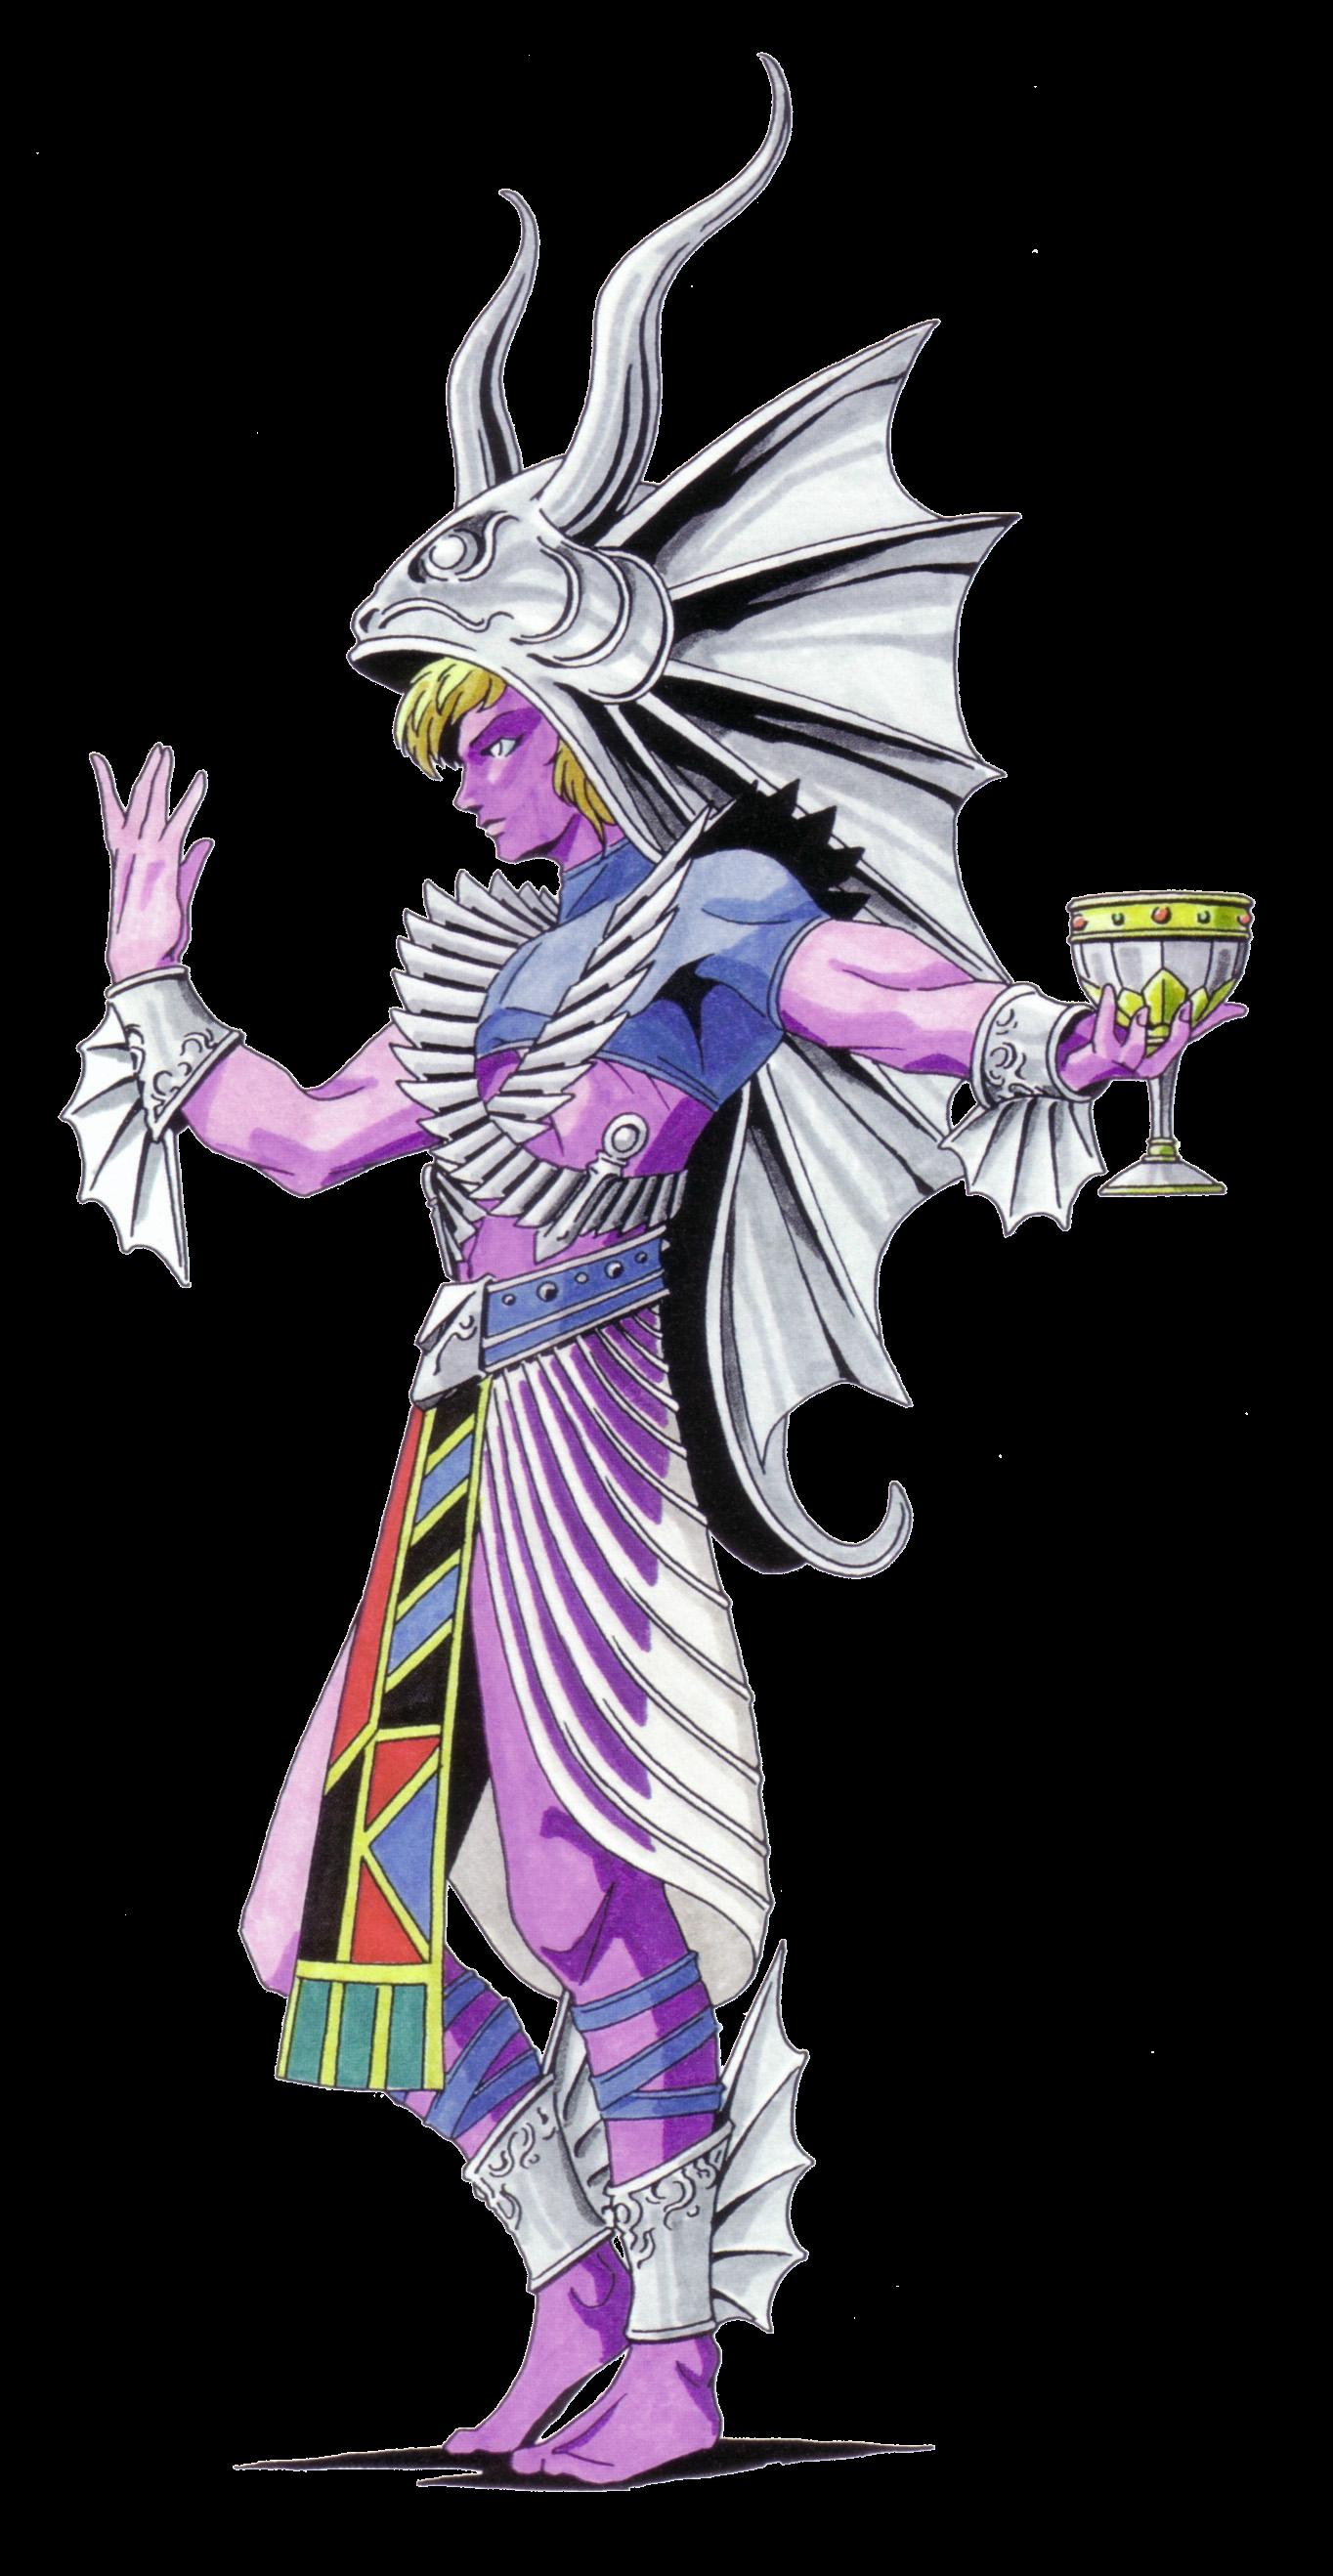 Baal (Shin Megami Tensei)